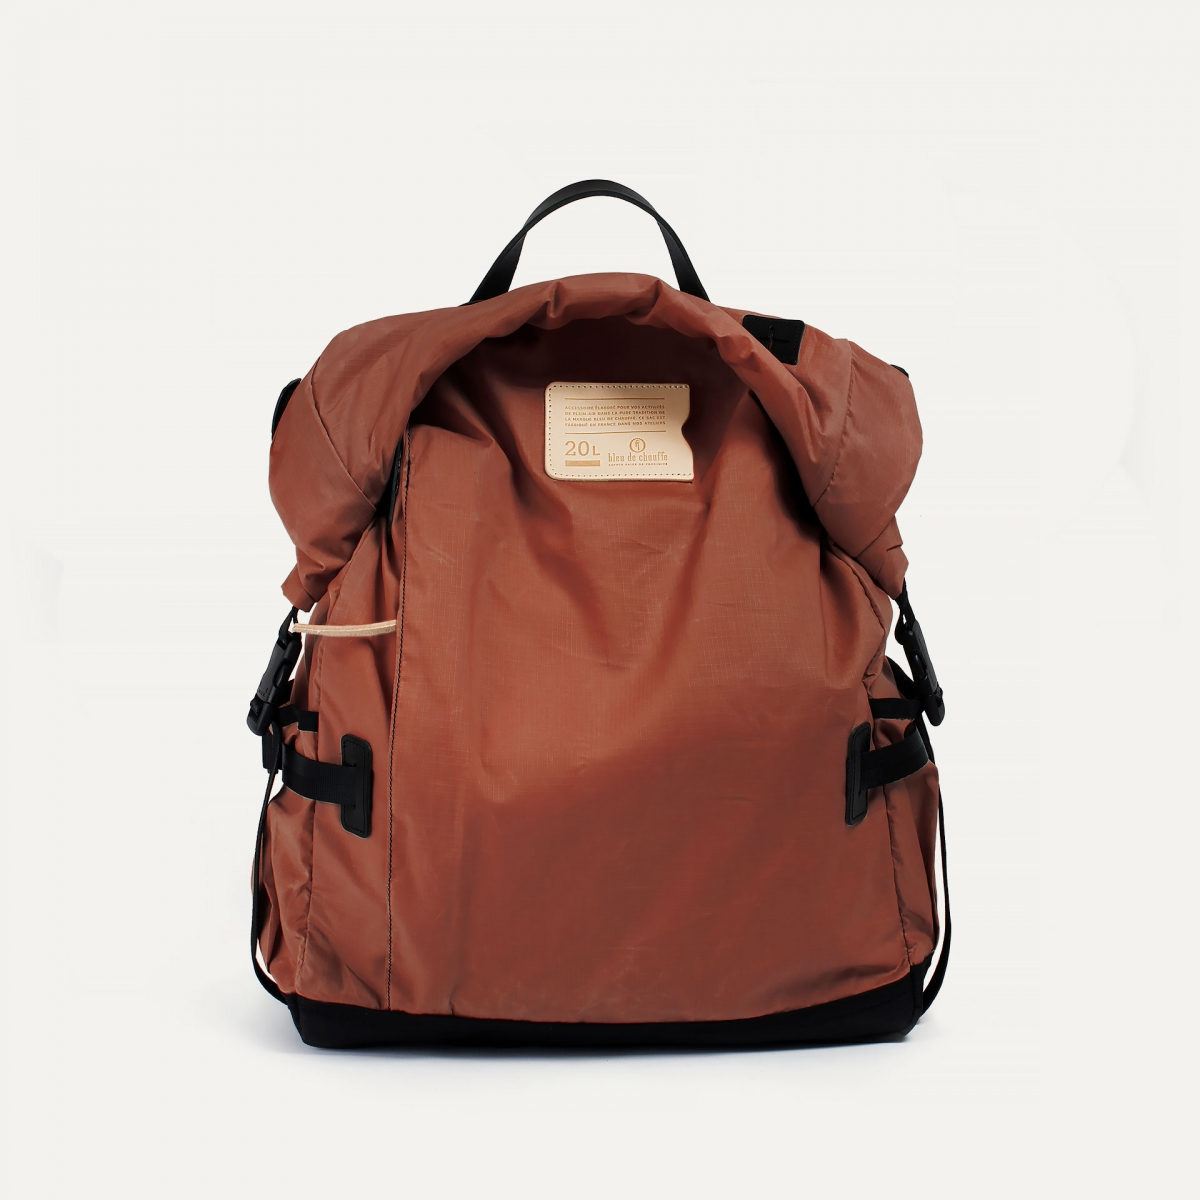 20L Basile Backpack - Burgundy (image n°1)